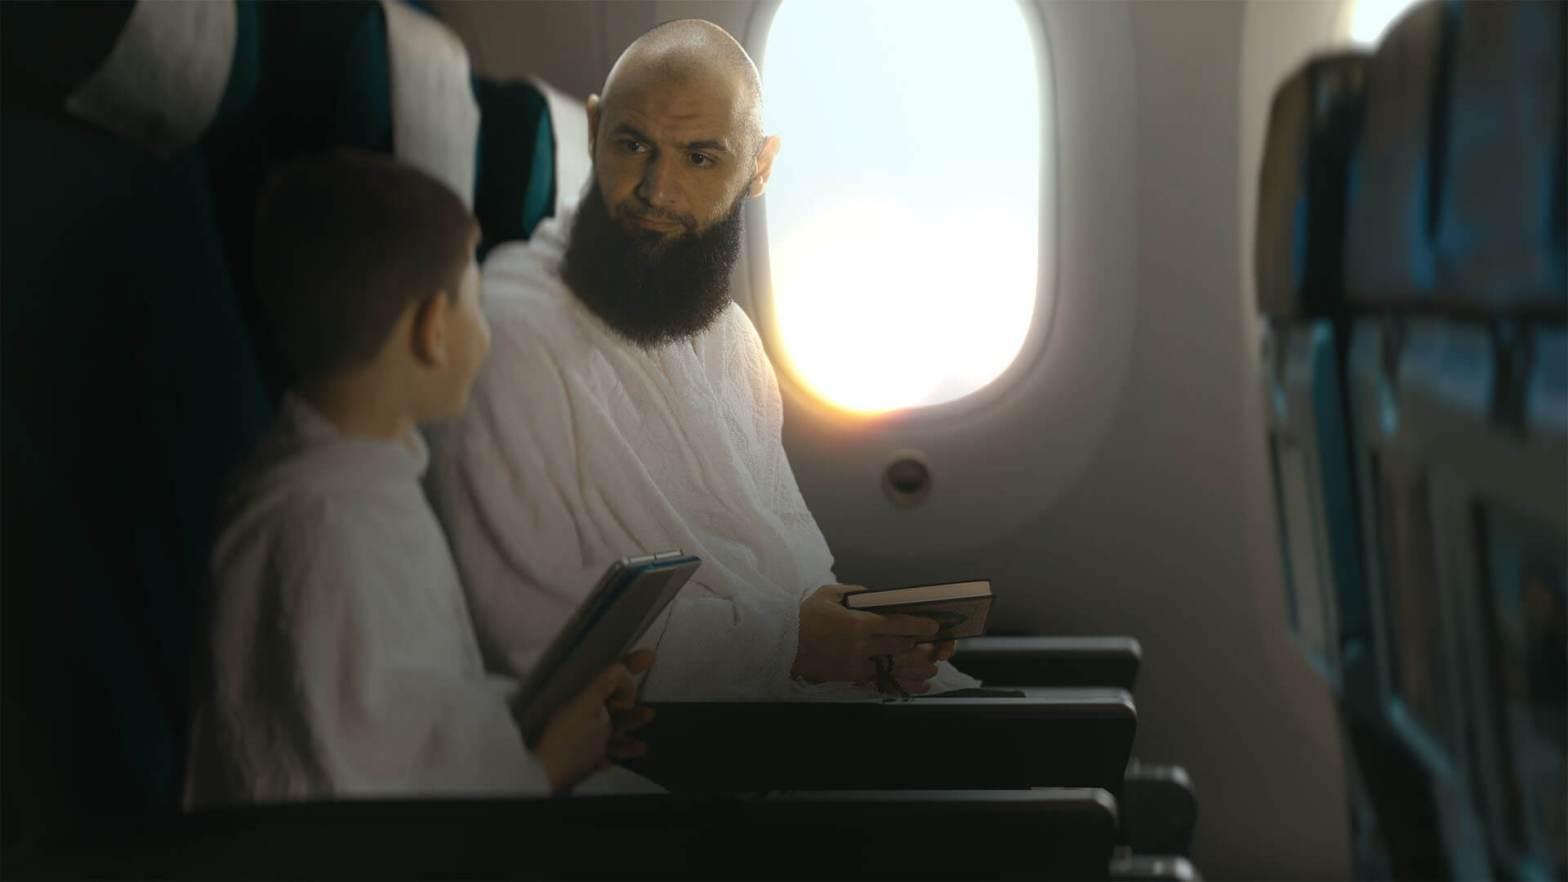 story of Hajj and Prophet Ibrahim